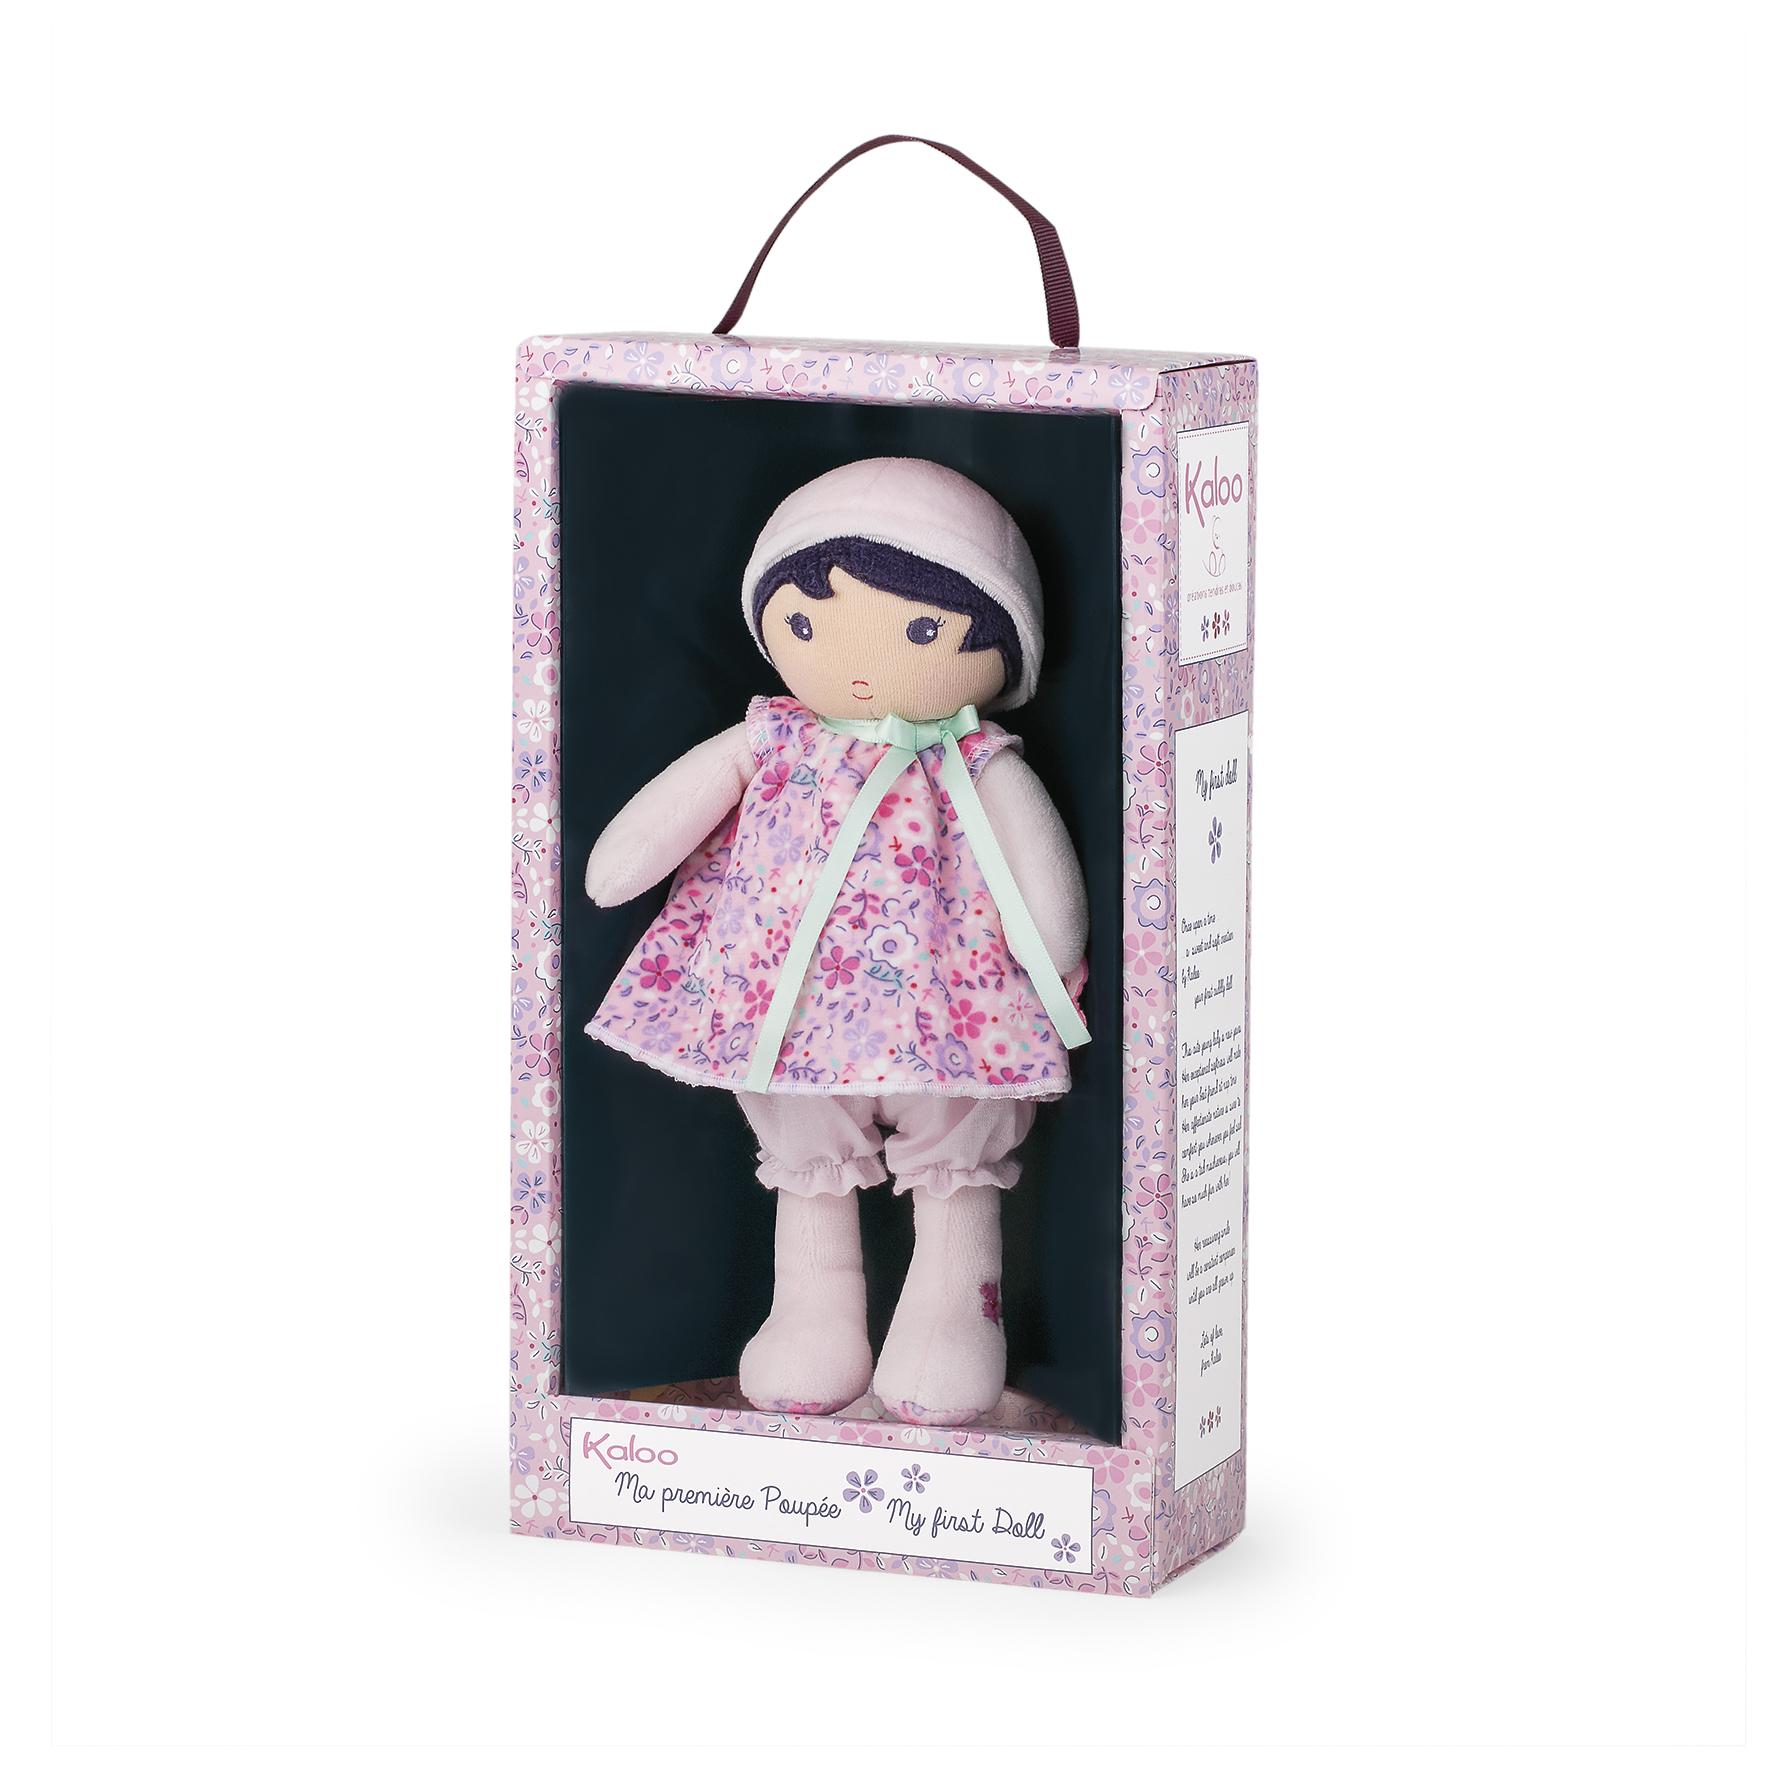 Tendresse - Fleur K Poupee - Medium ROSE Kaloo